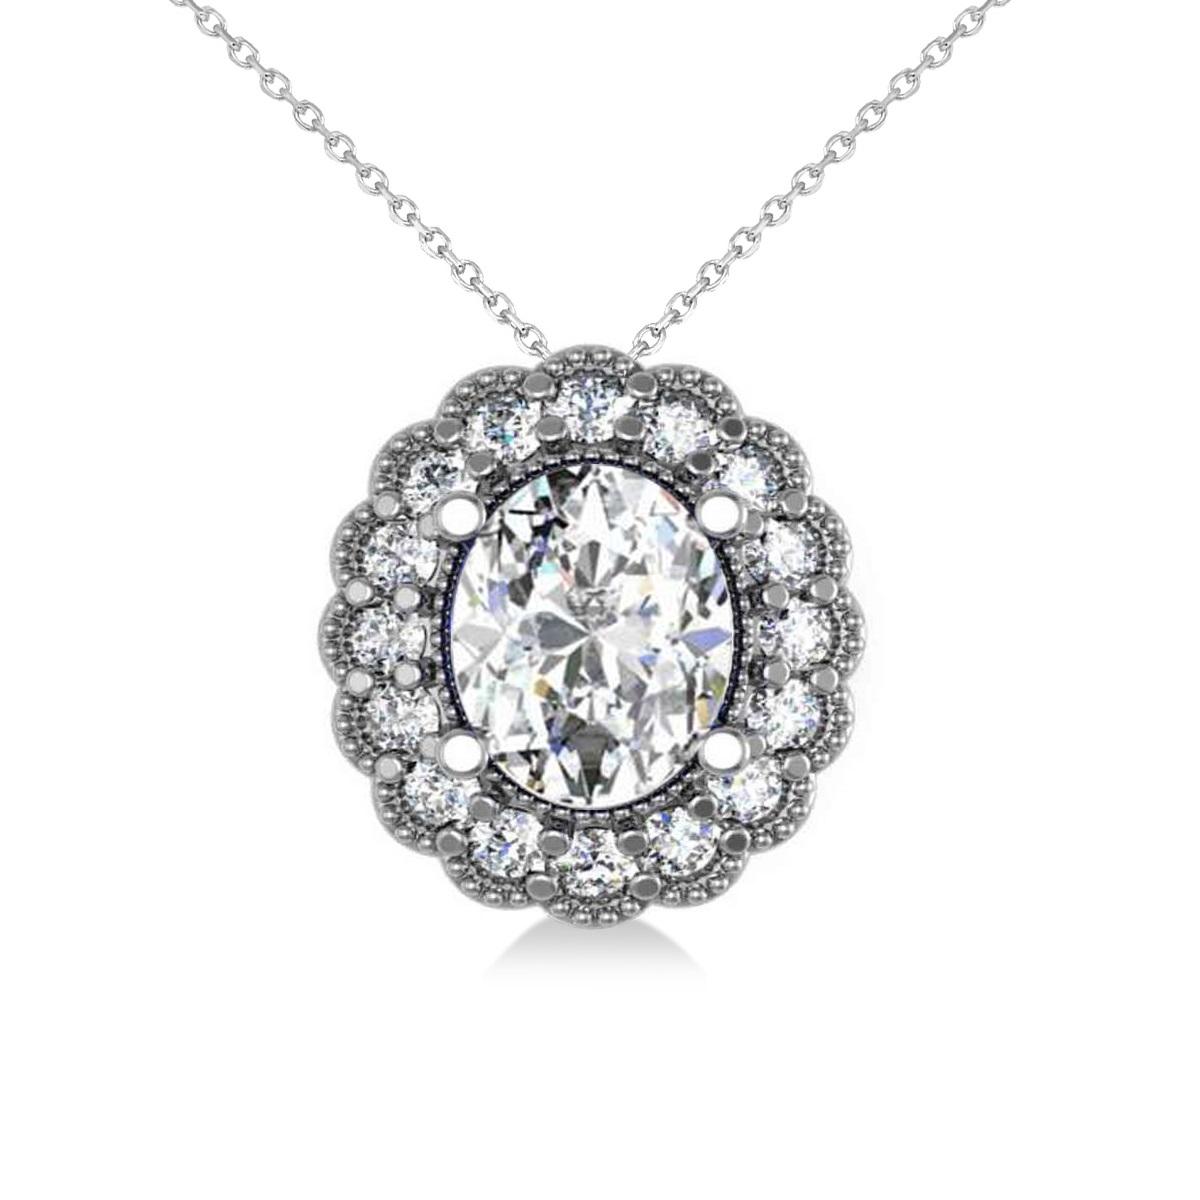 Diamond Floral Oval Halo Pendant Necklace 14k White Gold (2.48ct)